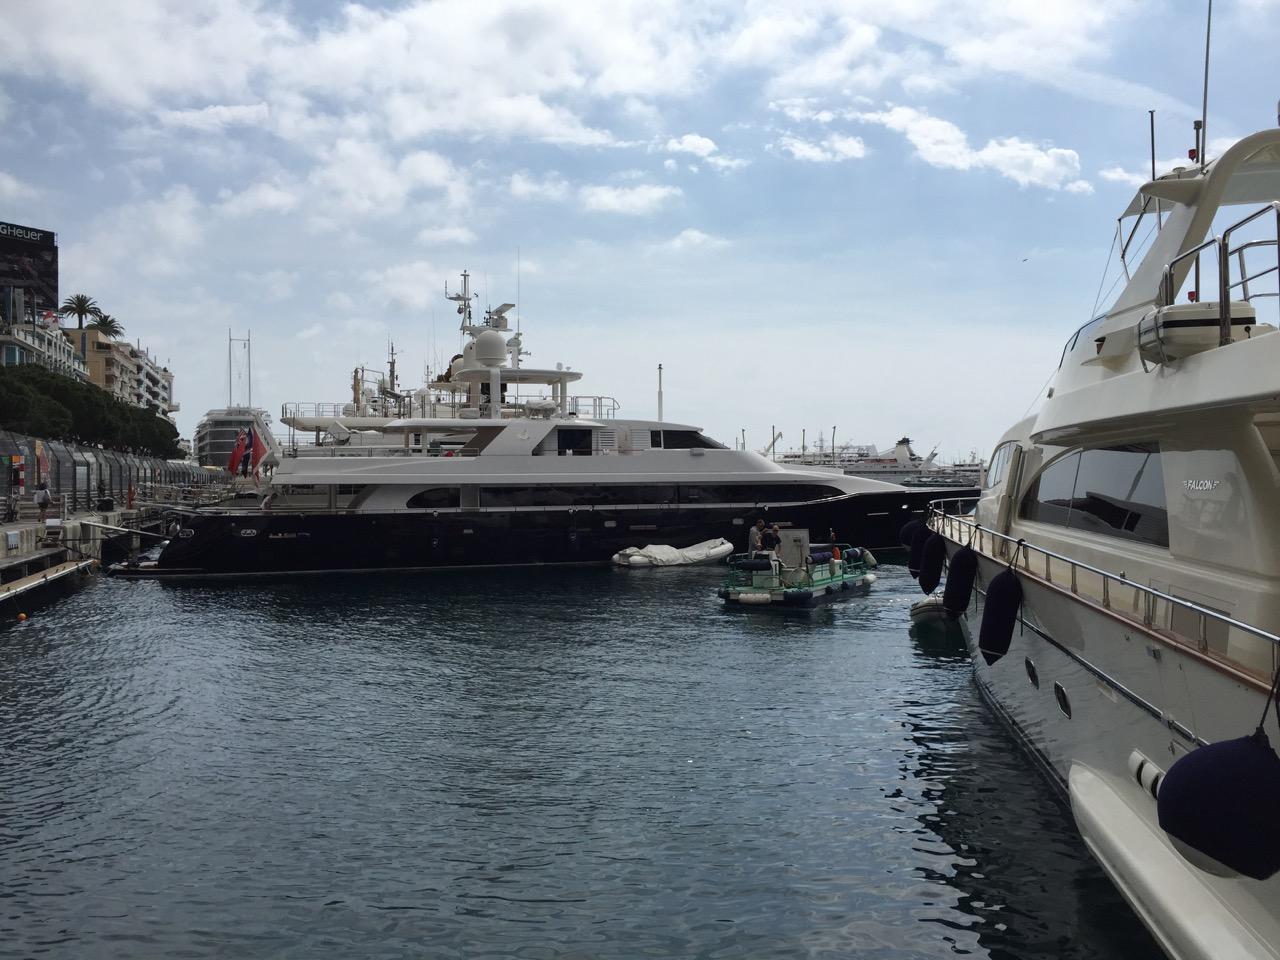 Lady in Blue at berth in Monaco on Quai Kennedy for the Grand Prix